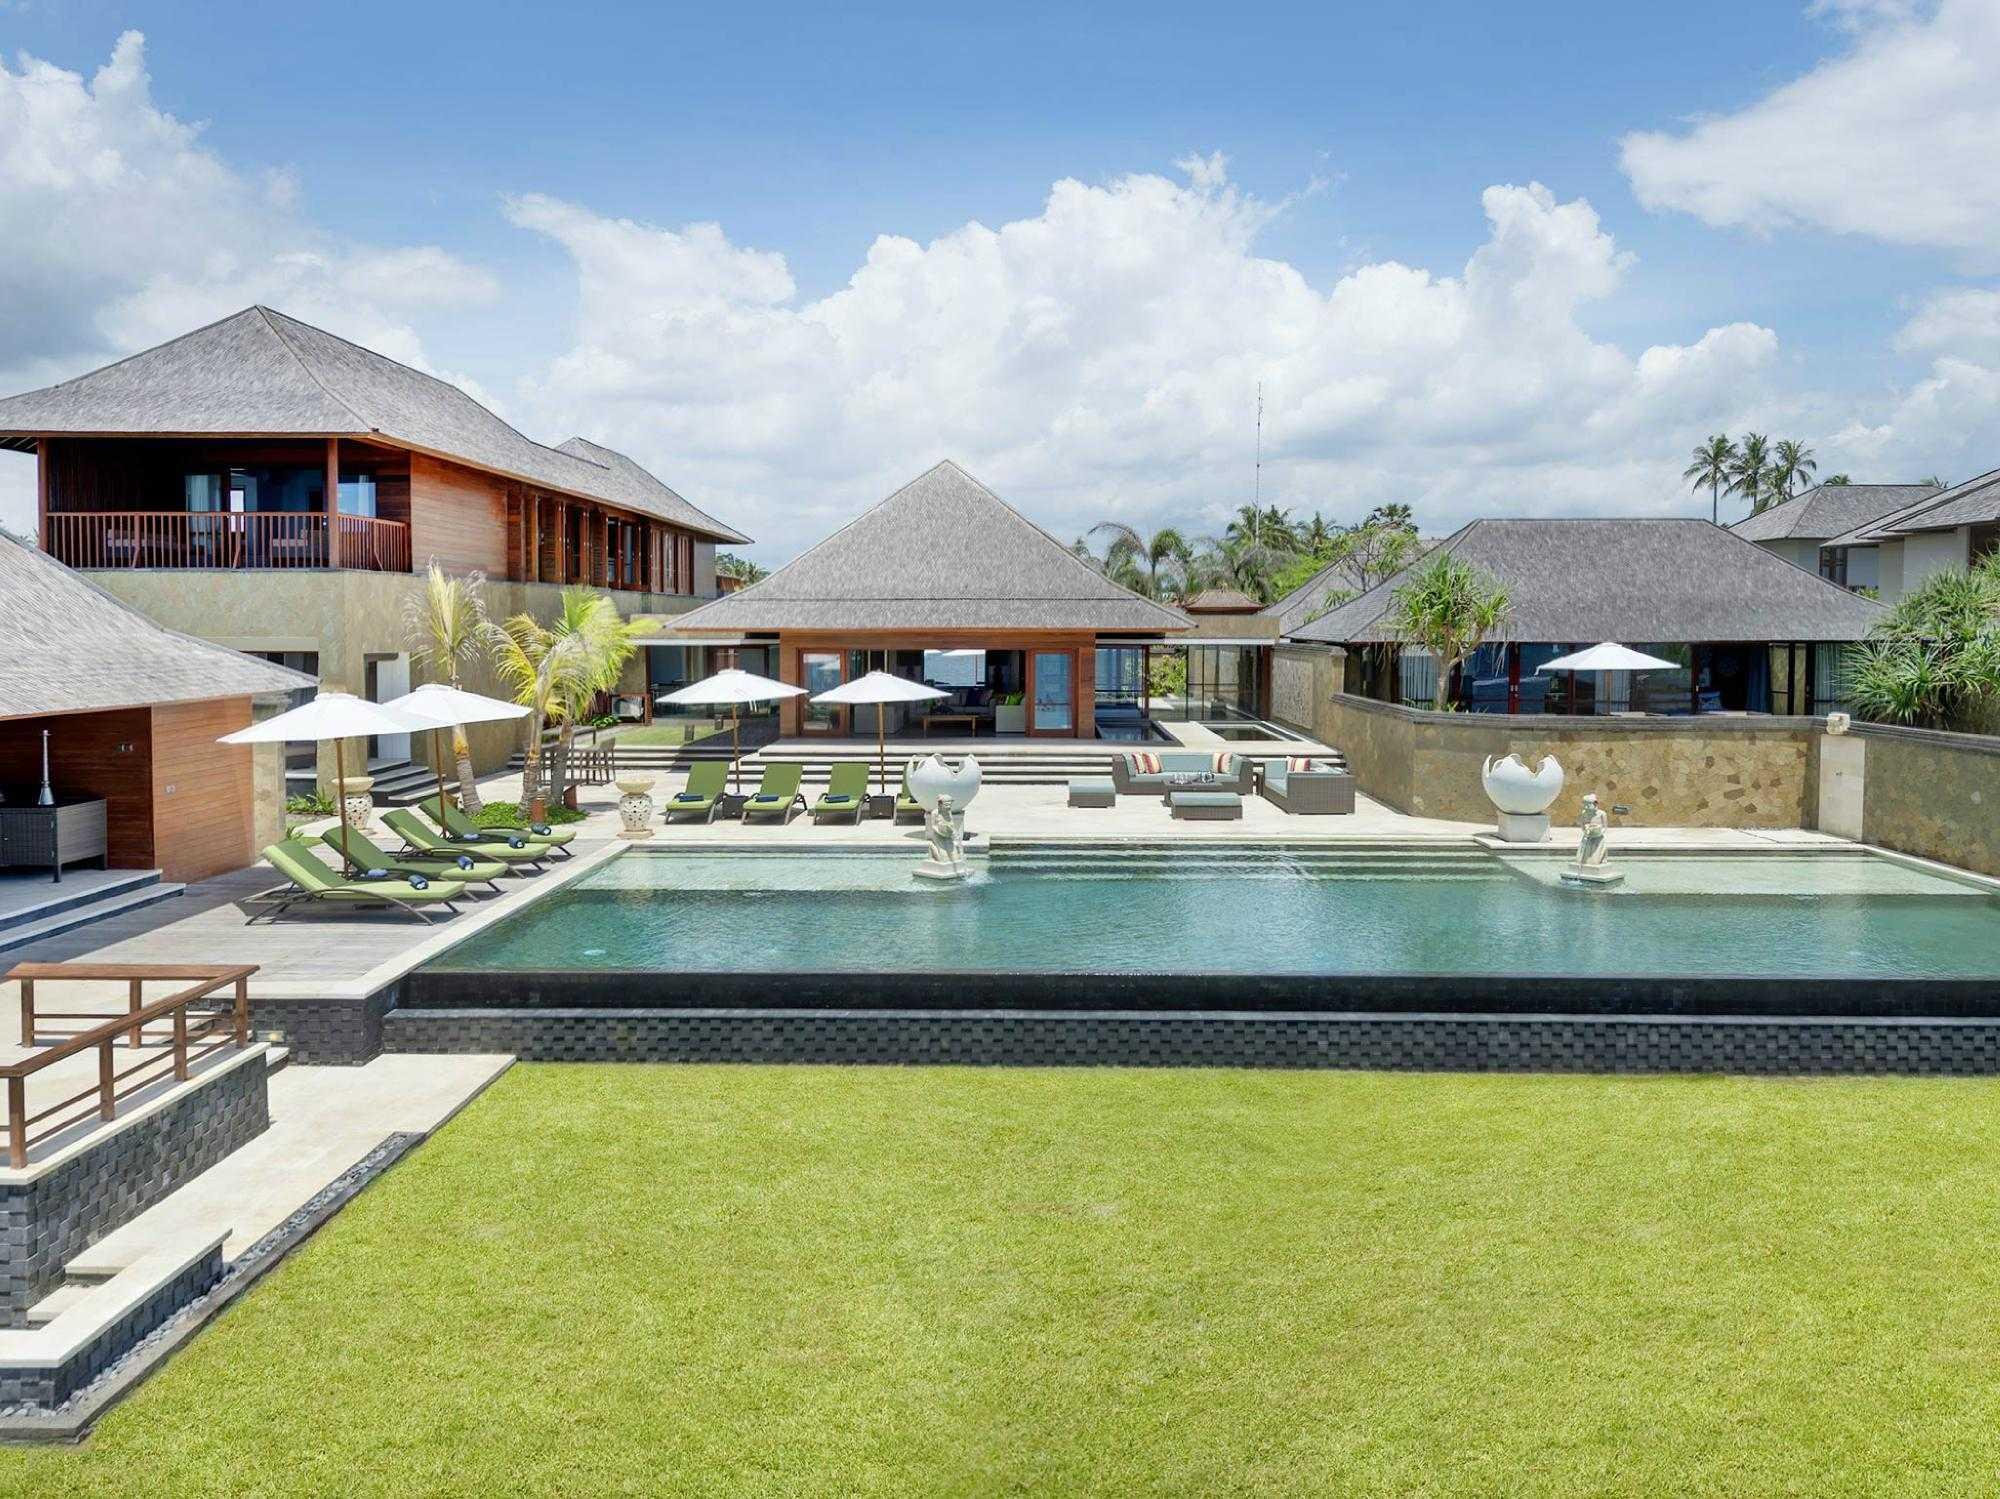 Agung Budi Raharsa | Architecture & Engineering Bayu Gita Villa - Bali Bali, Indonesia Bali, Indonesia Agung-Budi-Raharsa-Bayu-Gita-Villa-By-Agung-Budi-Raharsa-With-Csa  88345